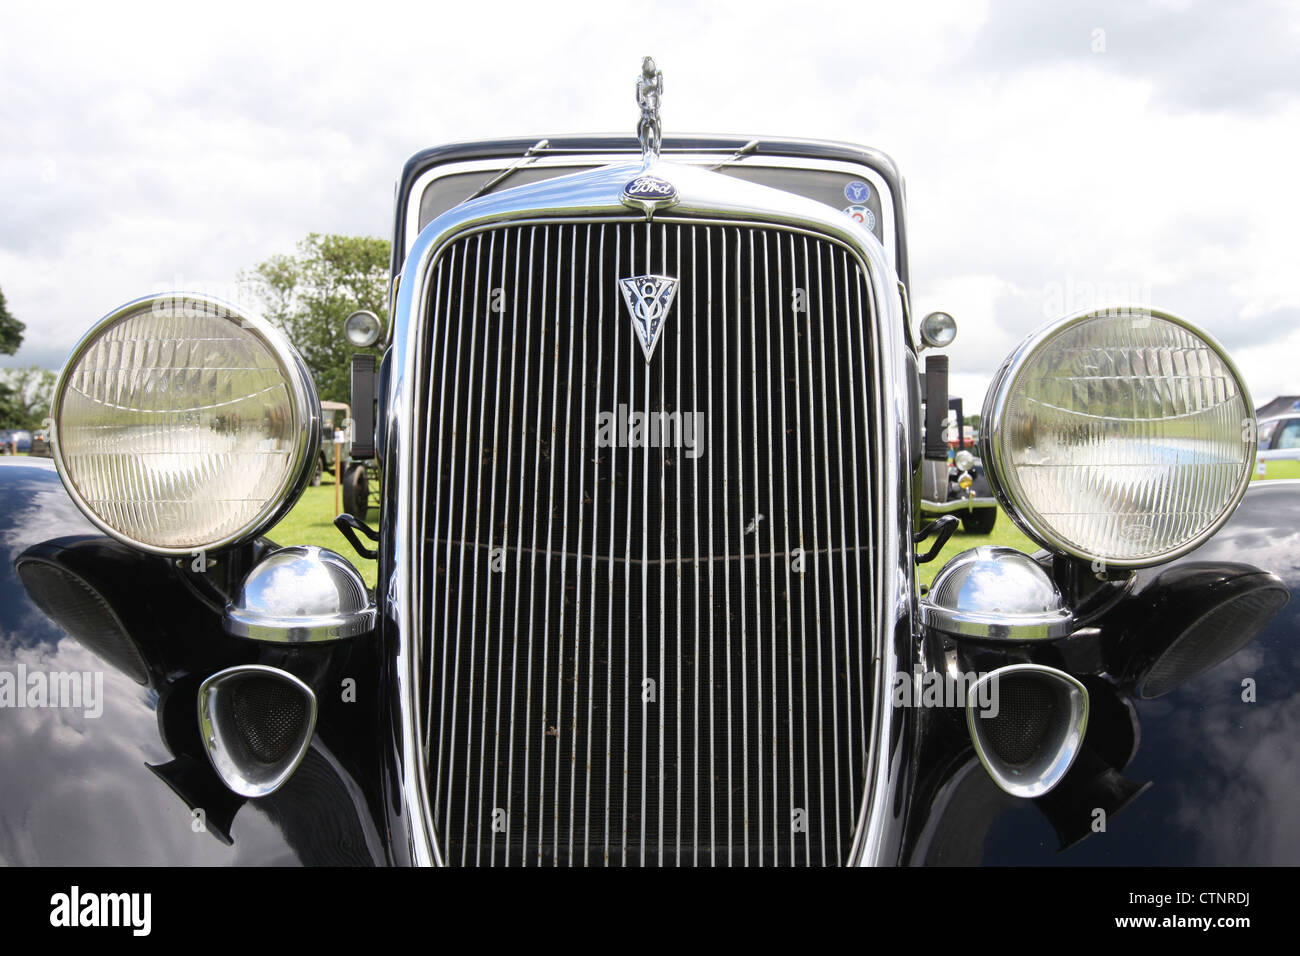 1934 Ford Stockfotos & 1934 Ford Bilder - Alamy